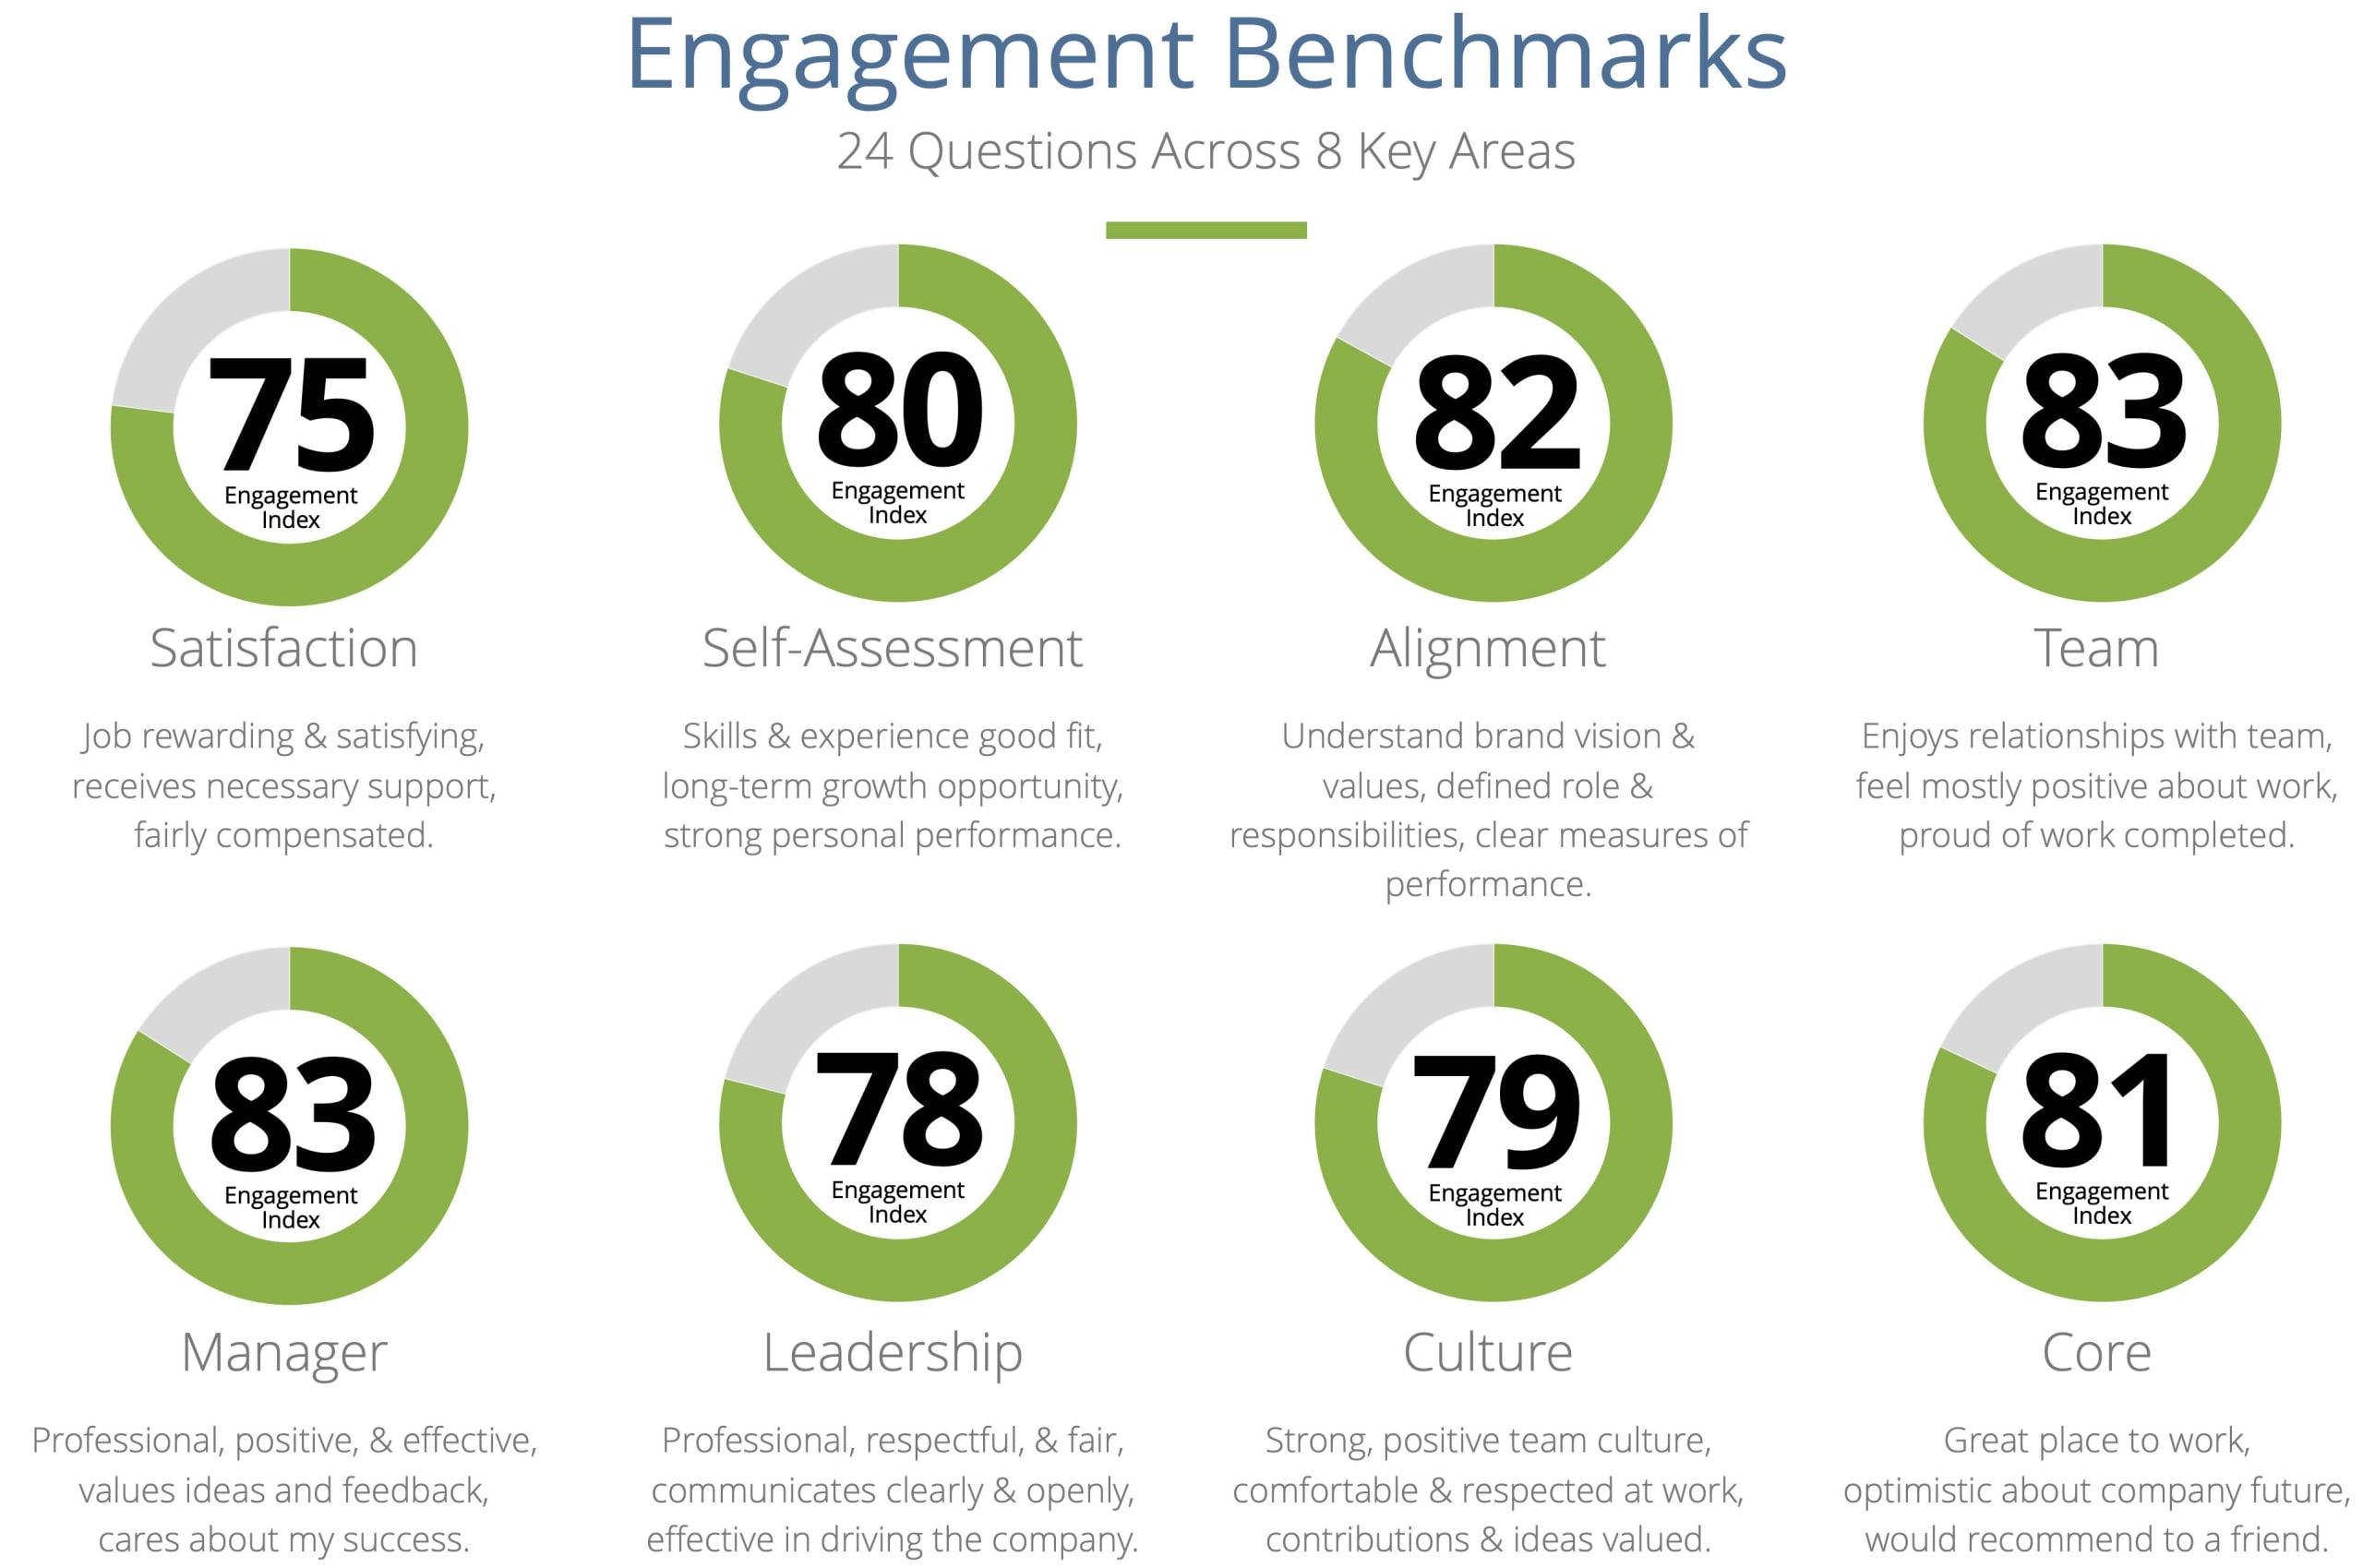 Infographic portraying franchising@work engagement benchmark data